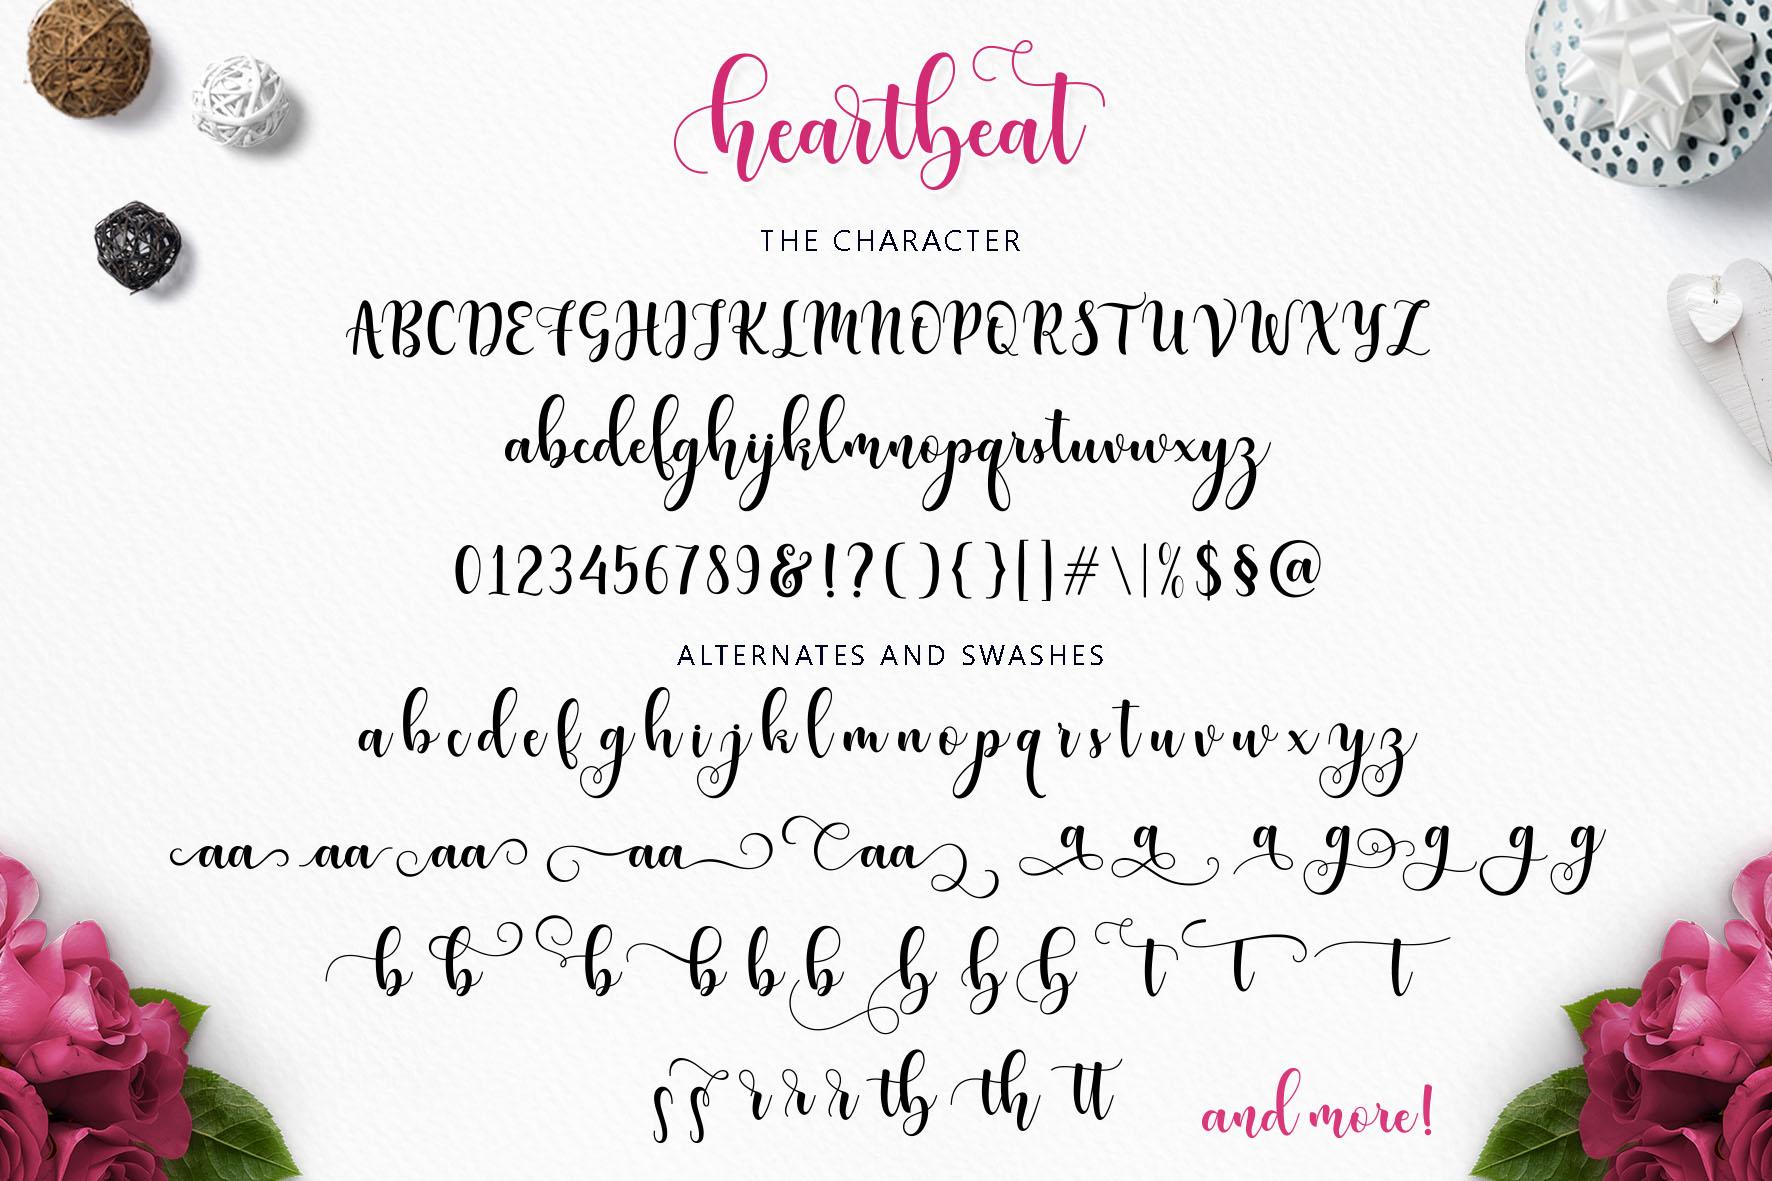 Heartbeat-Font-3